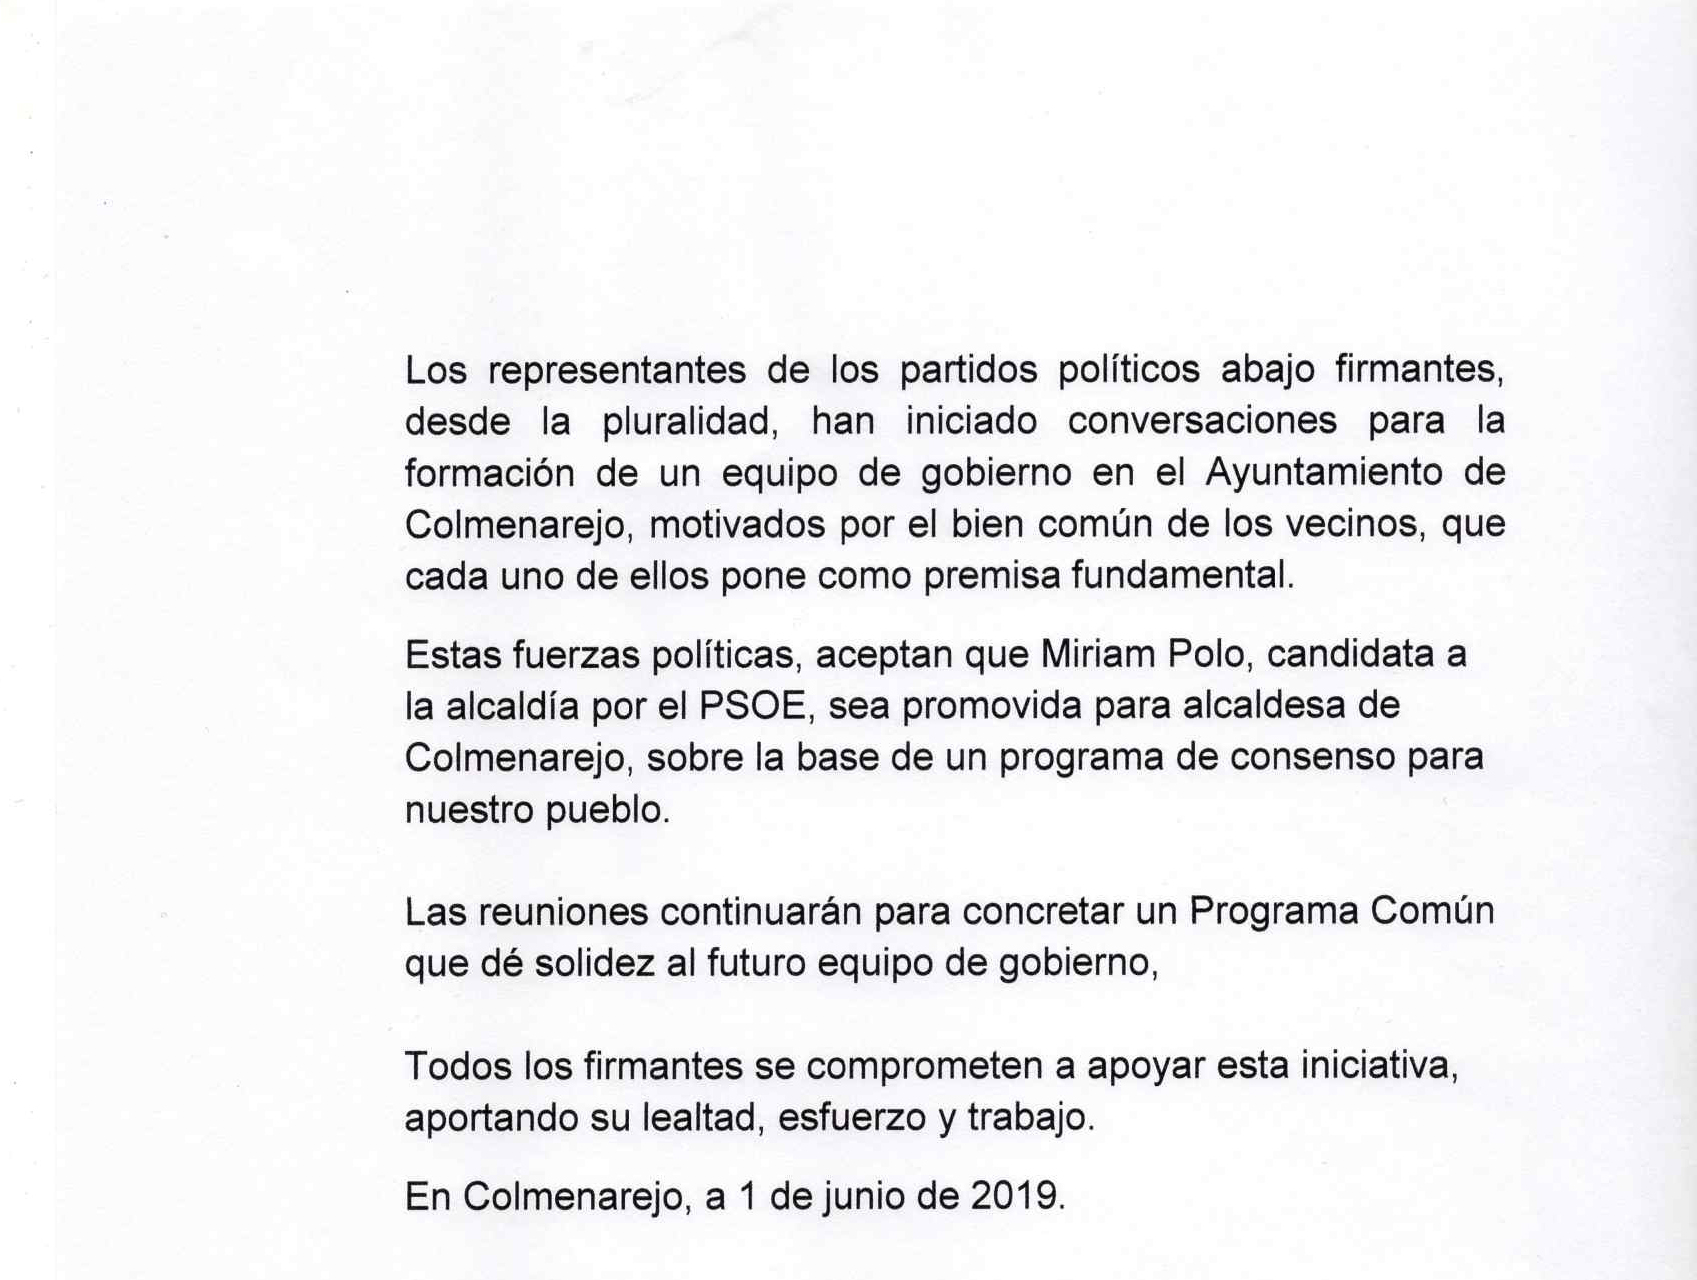 Acuerdo de Gobierno para Colmenarejo 2019 firmado por PSOE, VxC, AxC, UNIDAS PODEMOS IU